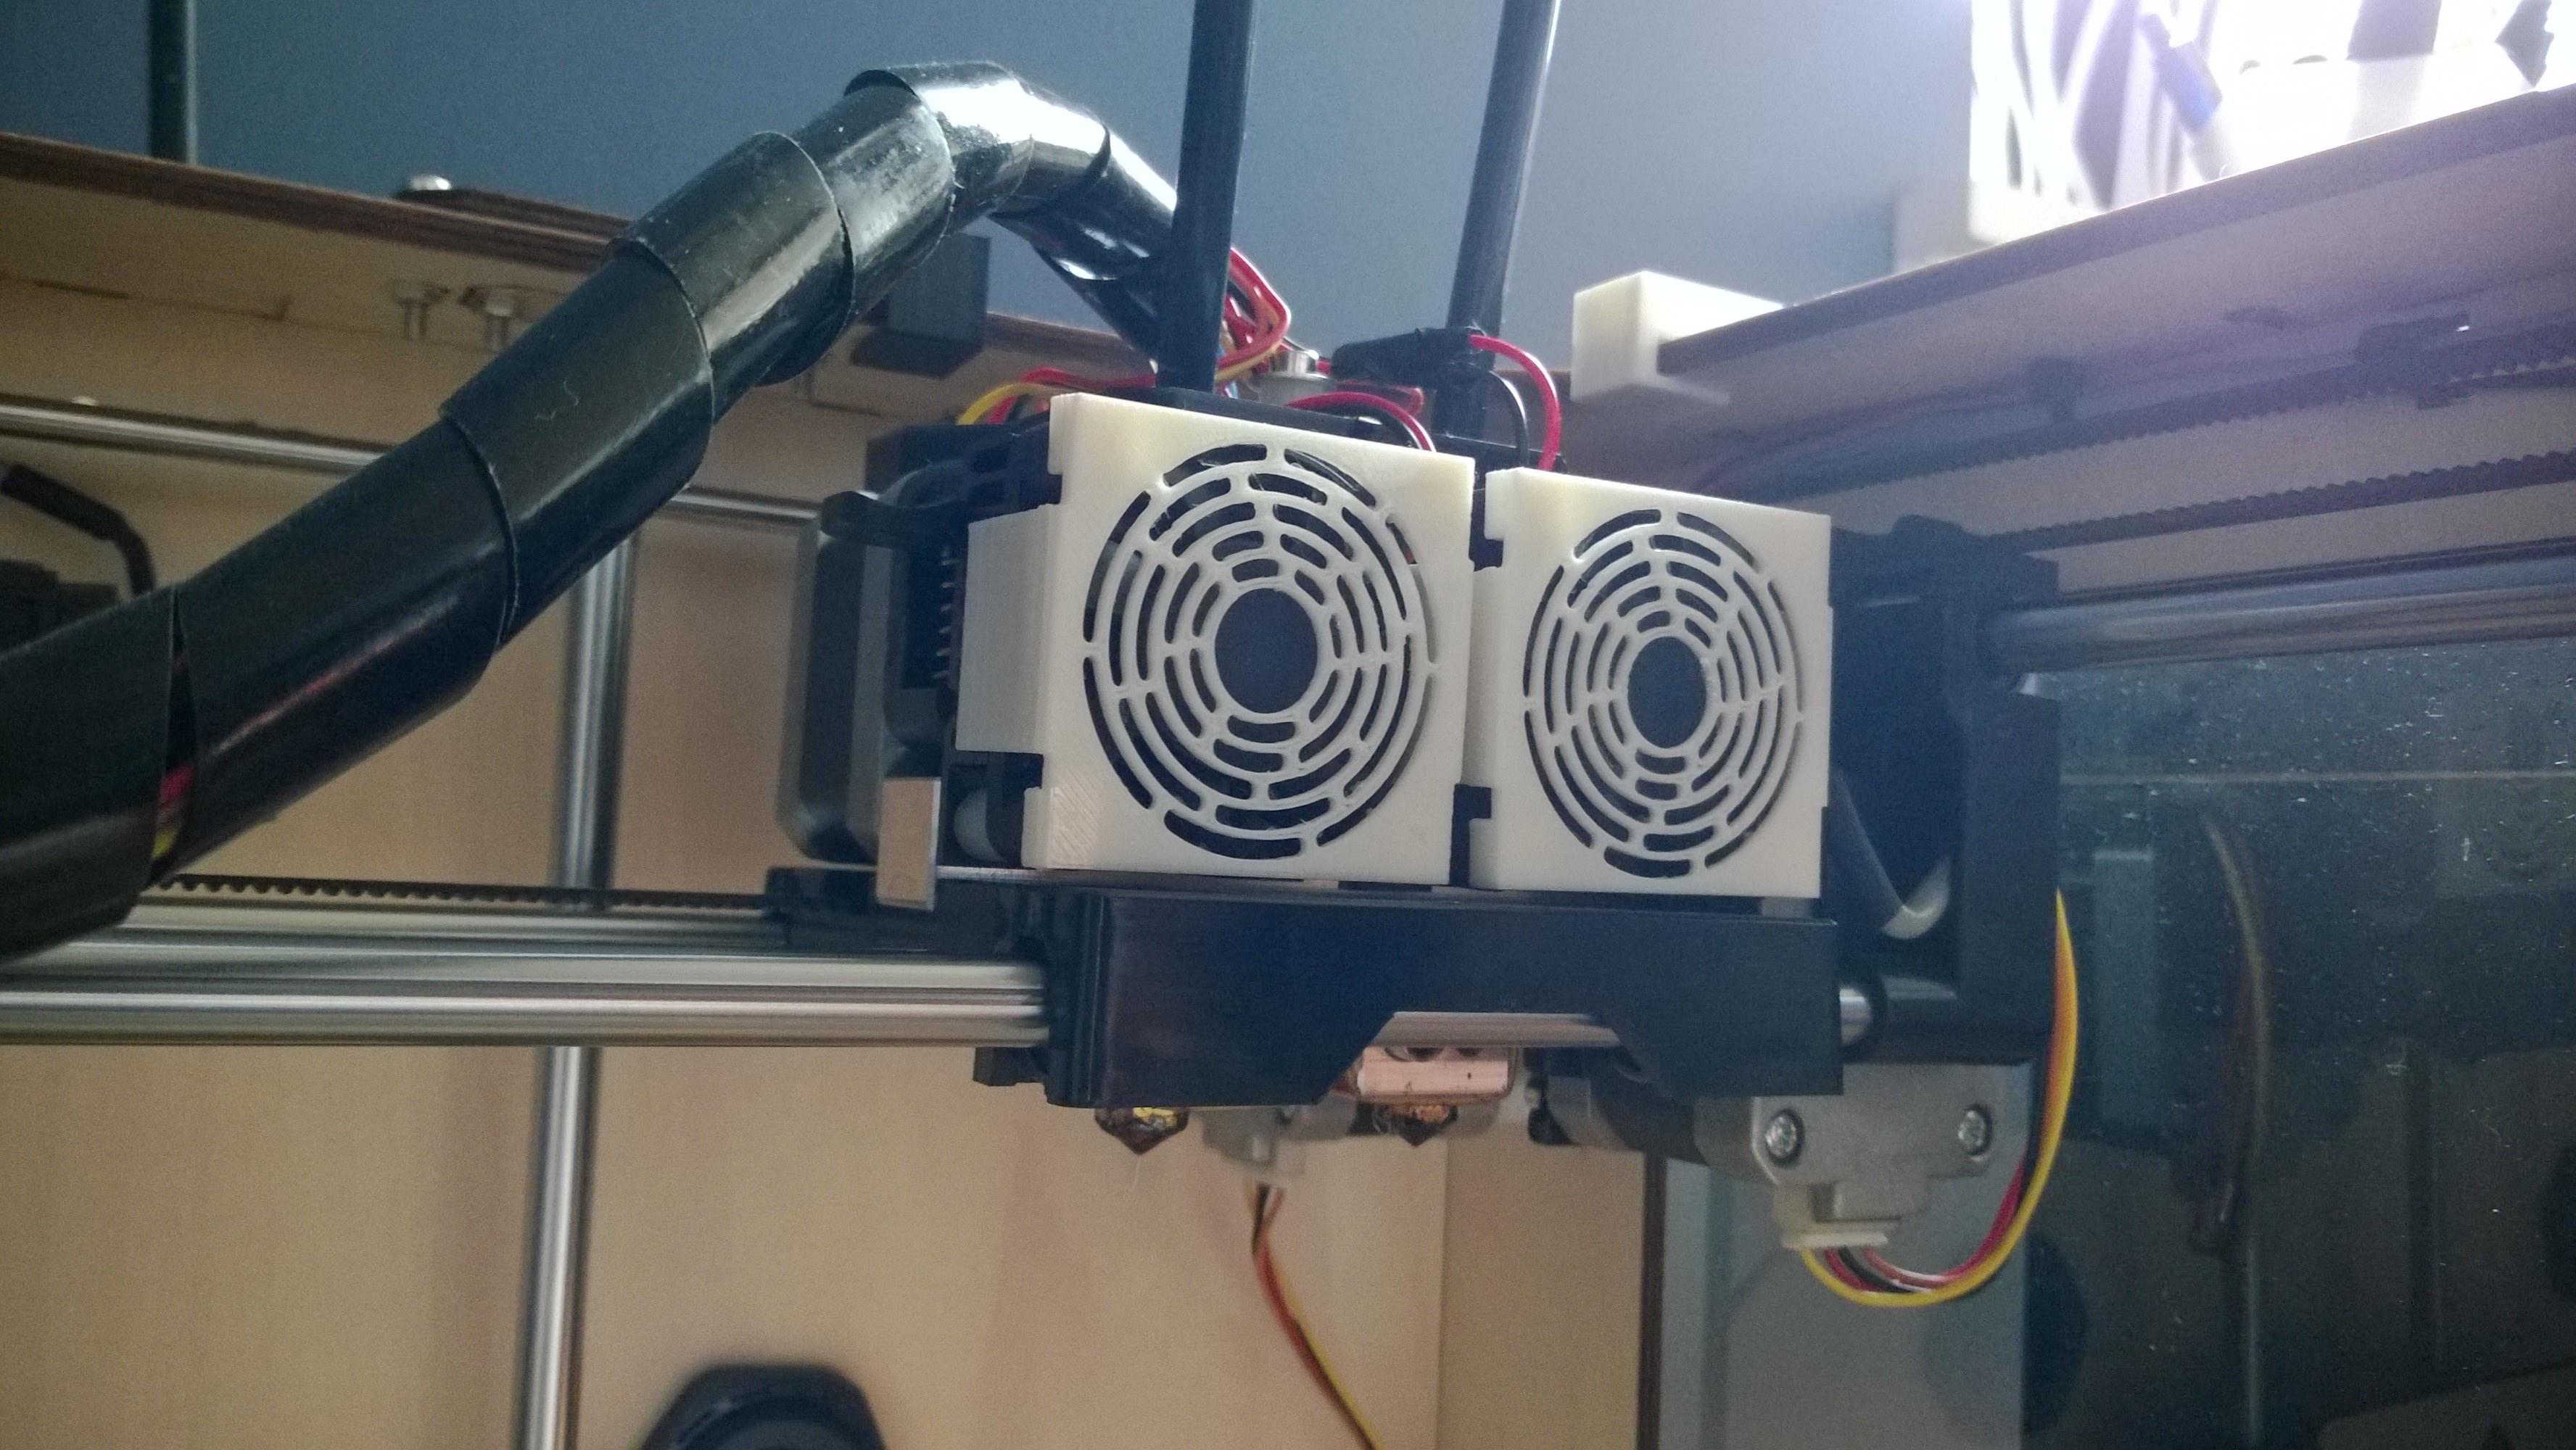 012a - Fan Shroud for FlashForge Creator Creator X 3D printer -